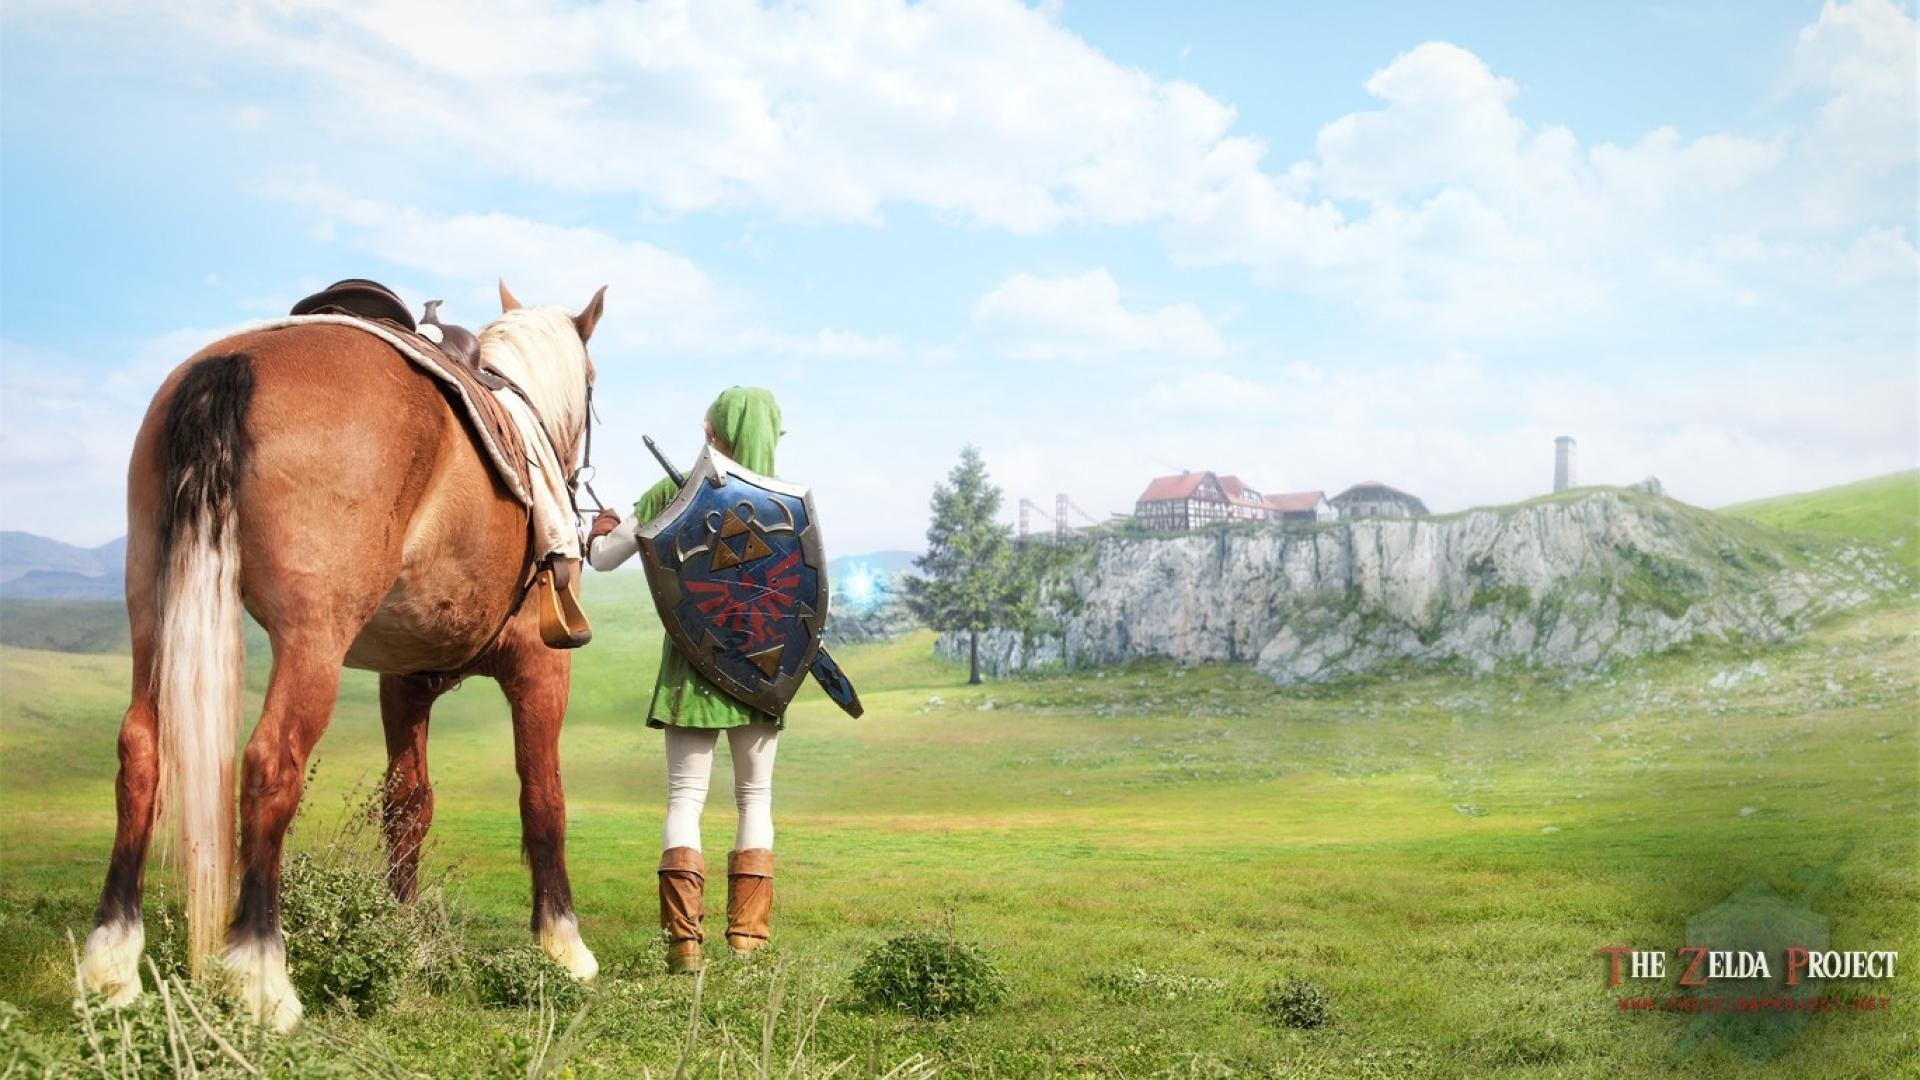 Free Legend Of Zelda Ocarina Of Time Wallpaper Phone Â« Long Wallpapers